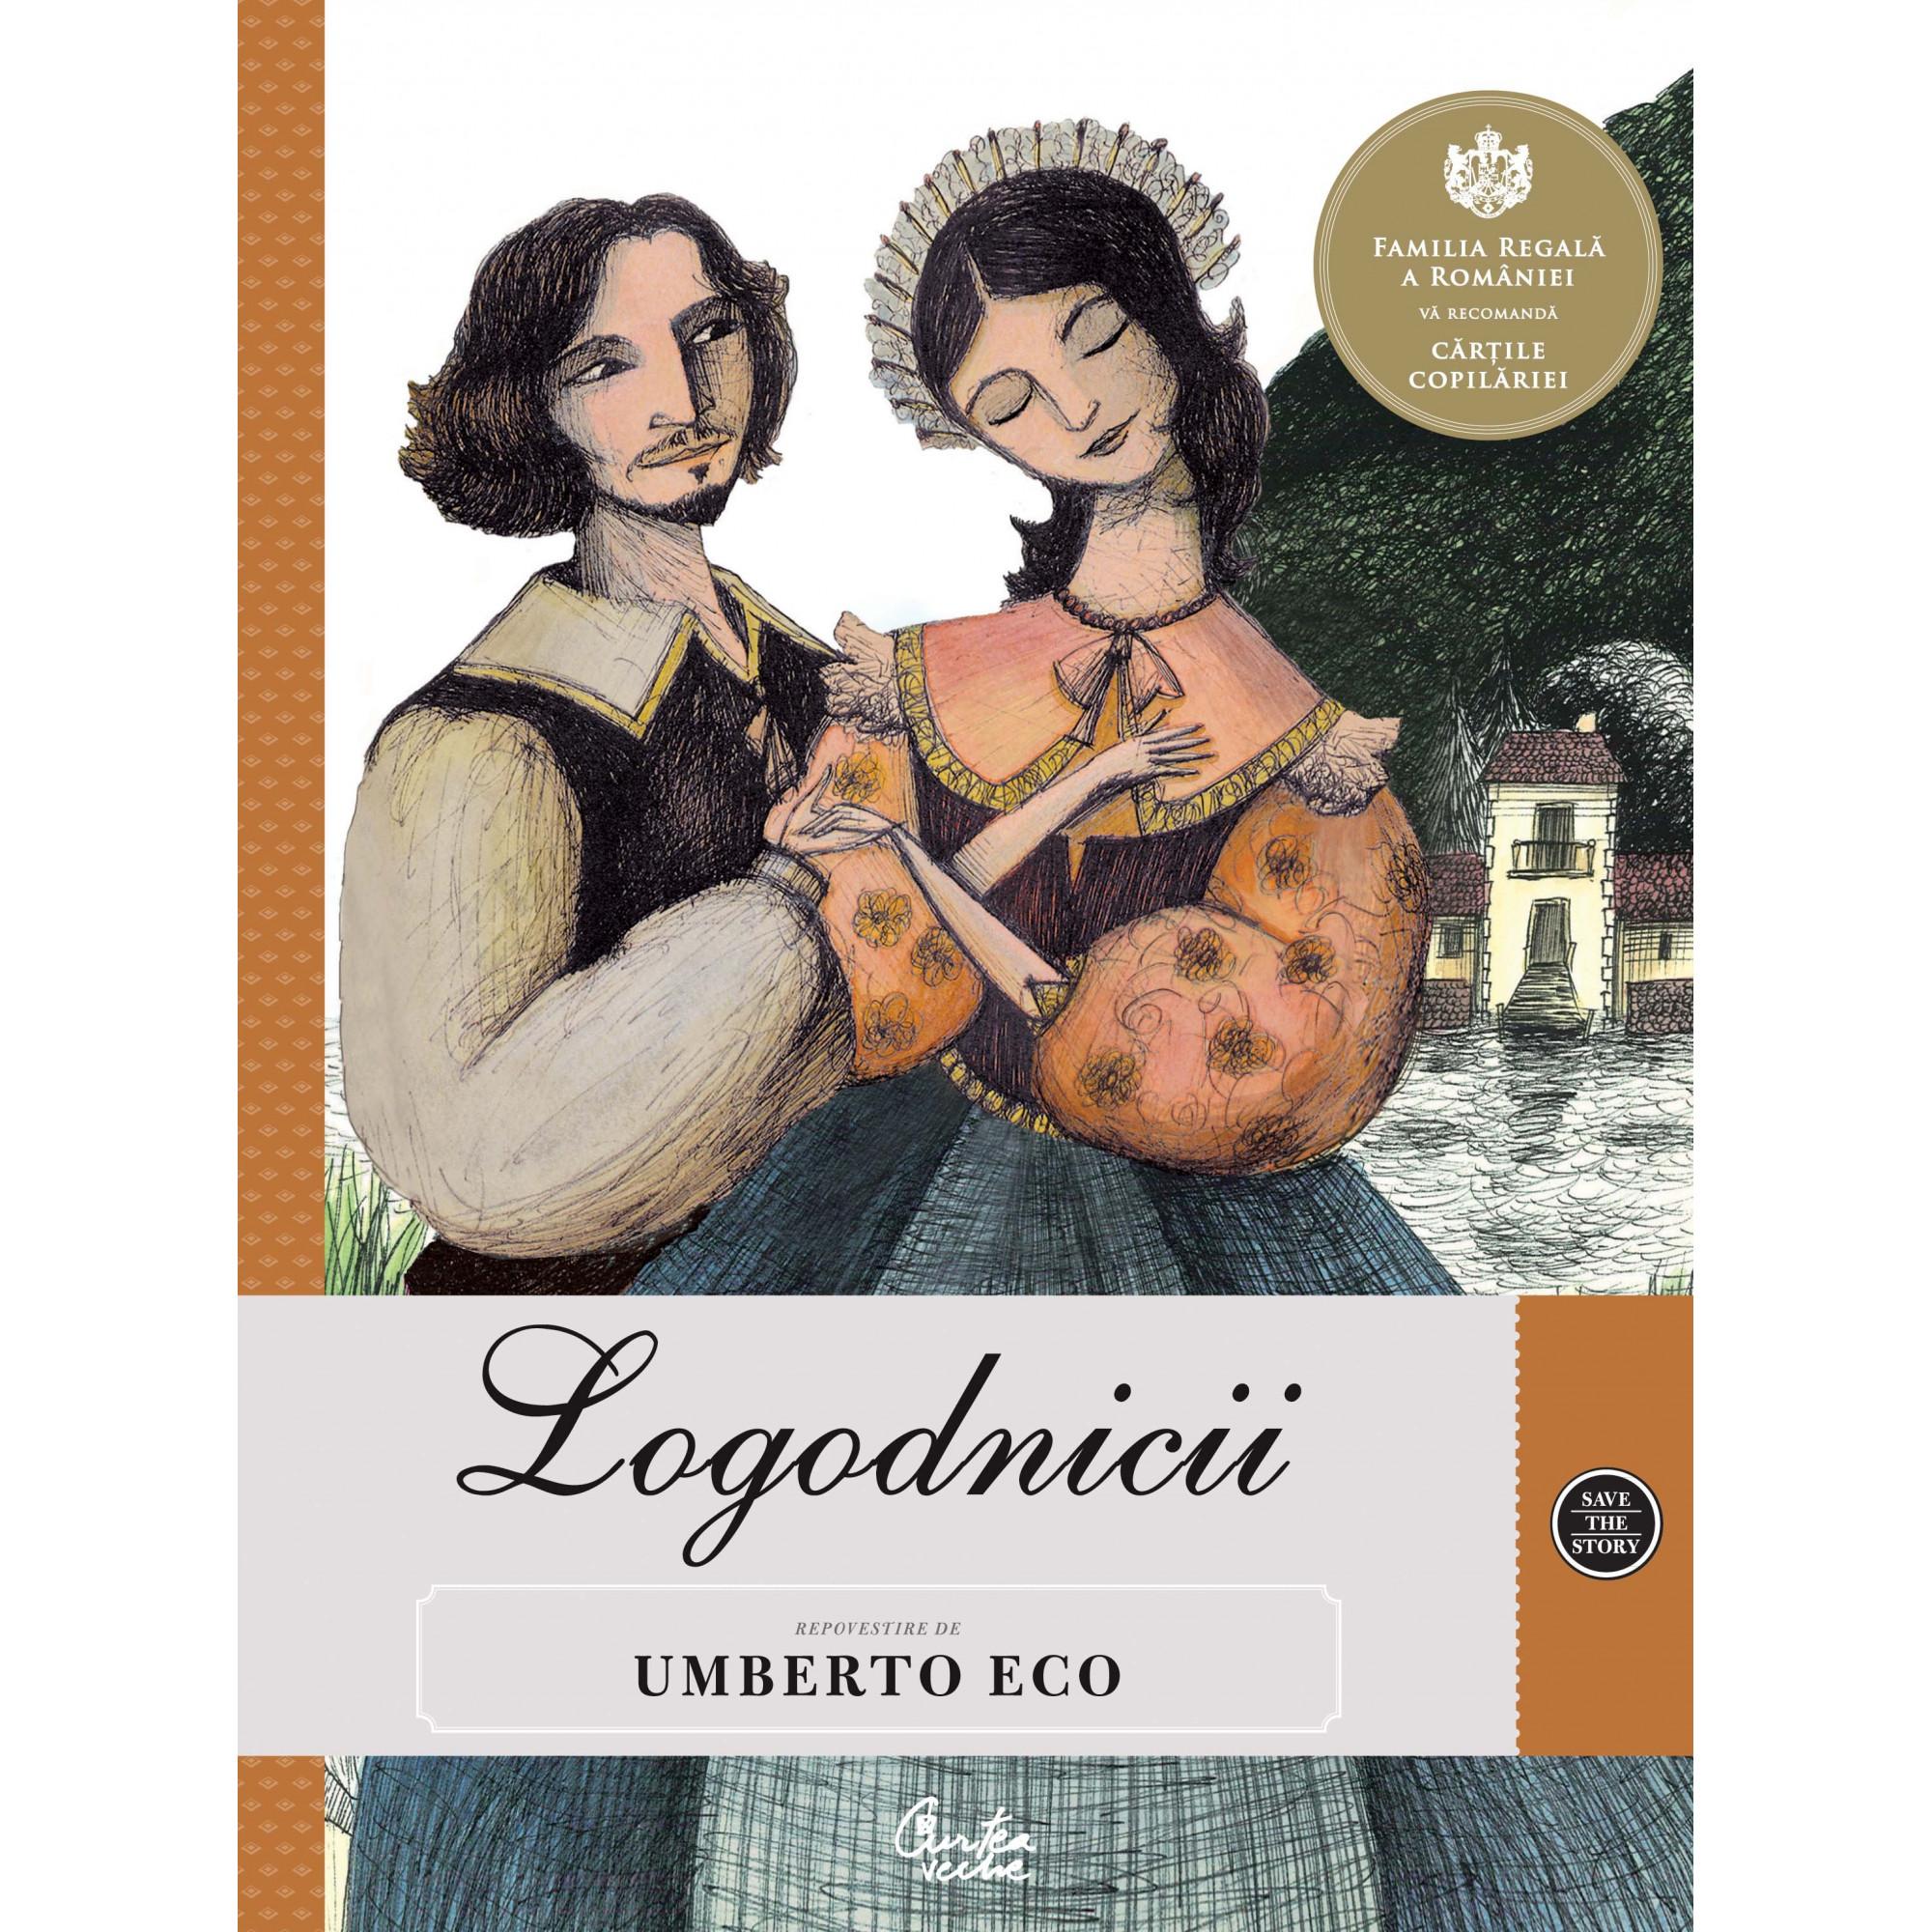 Logodnicii. Repovestire de Umberto Eco după romanul lui Alessandro Manzoni; Umberto Eco